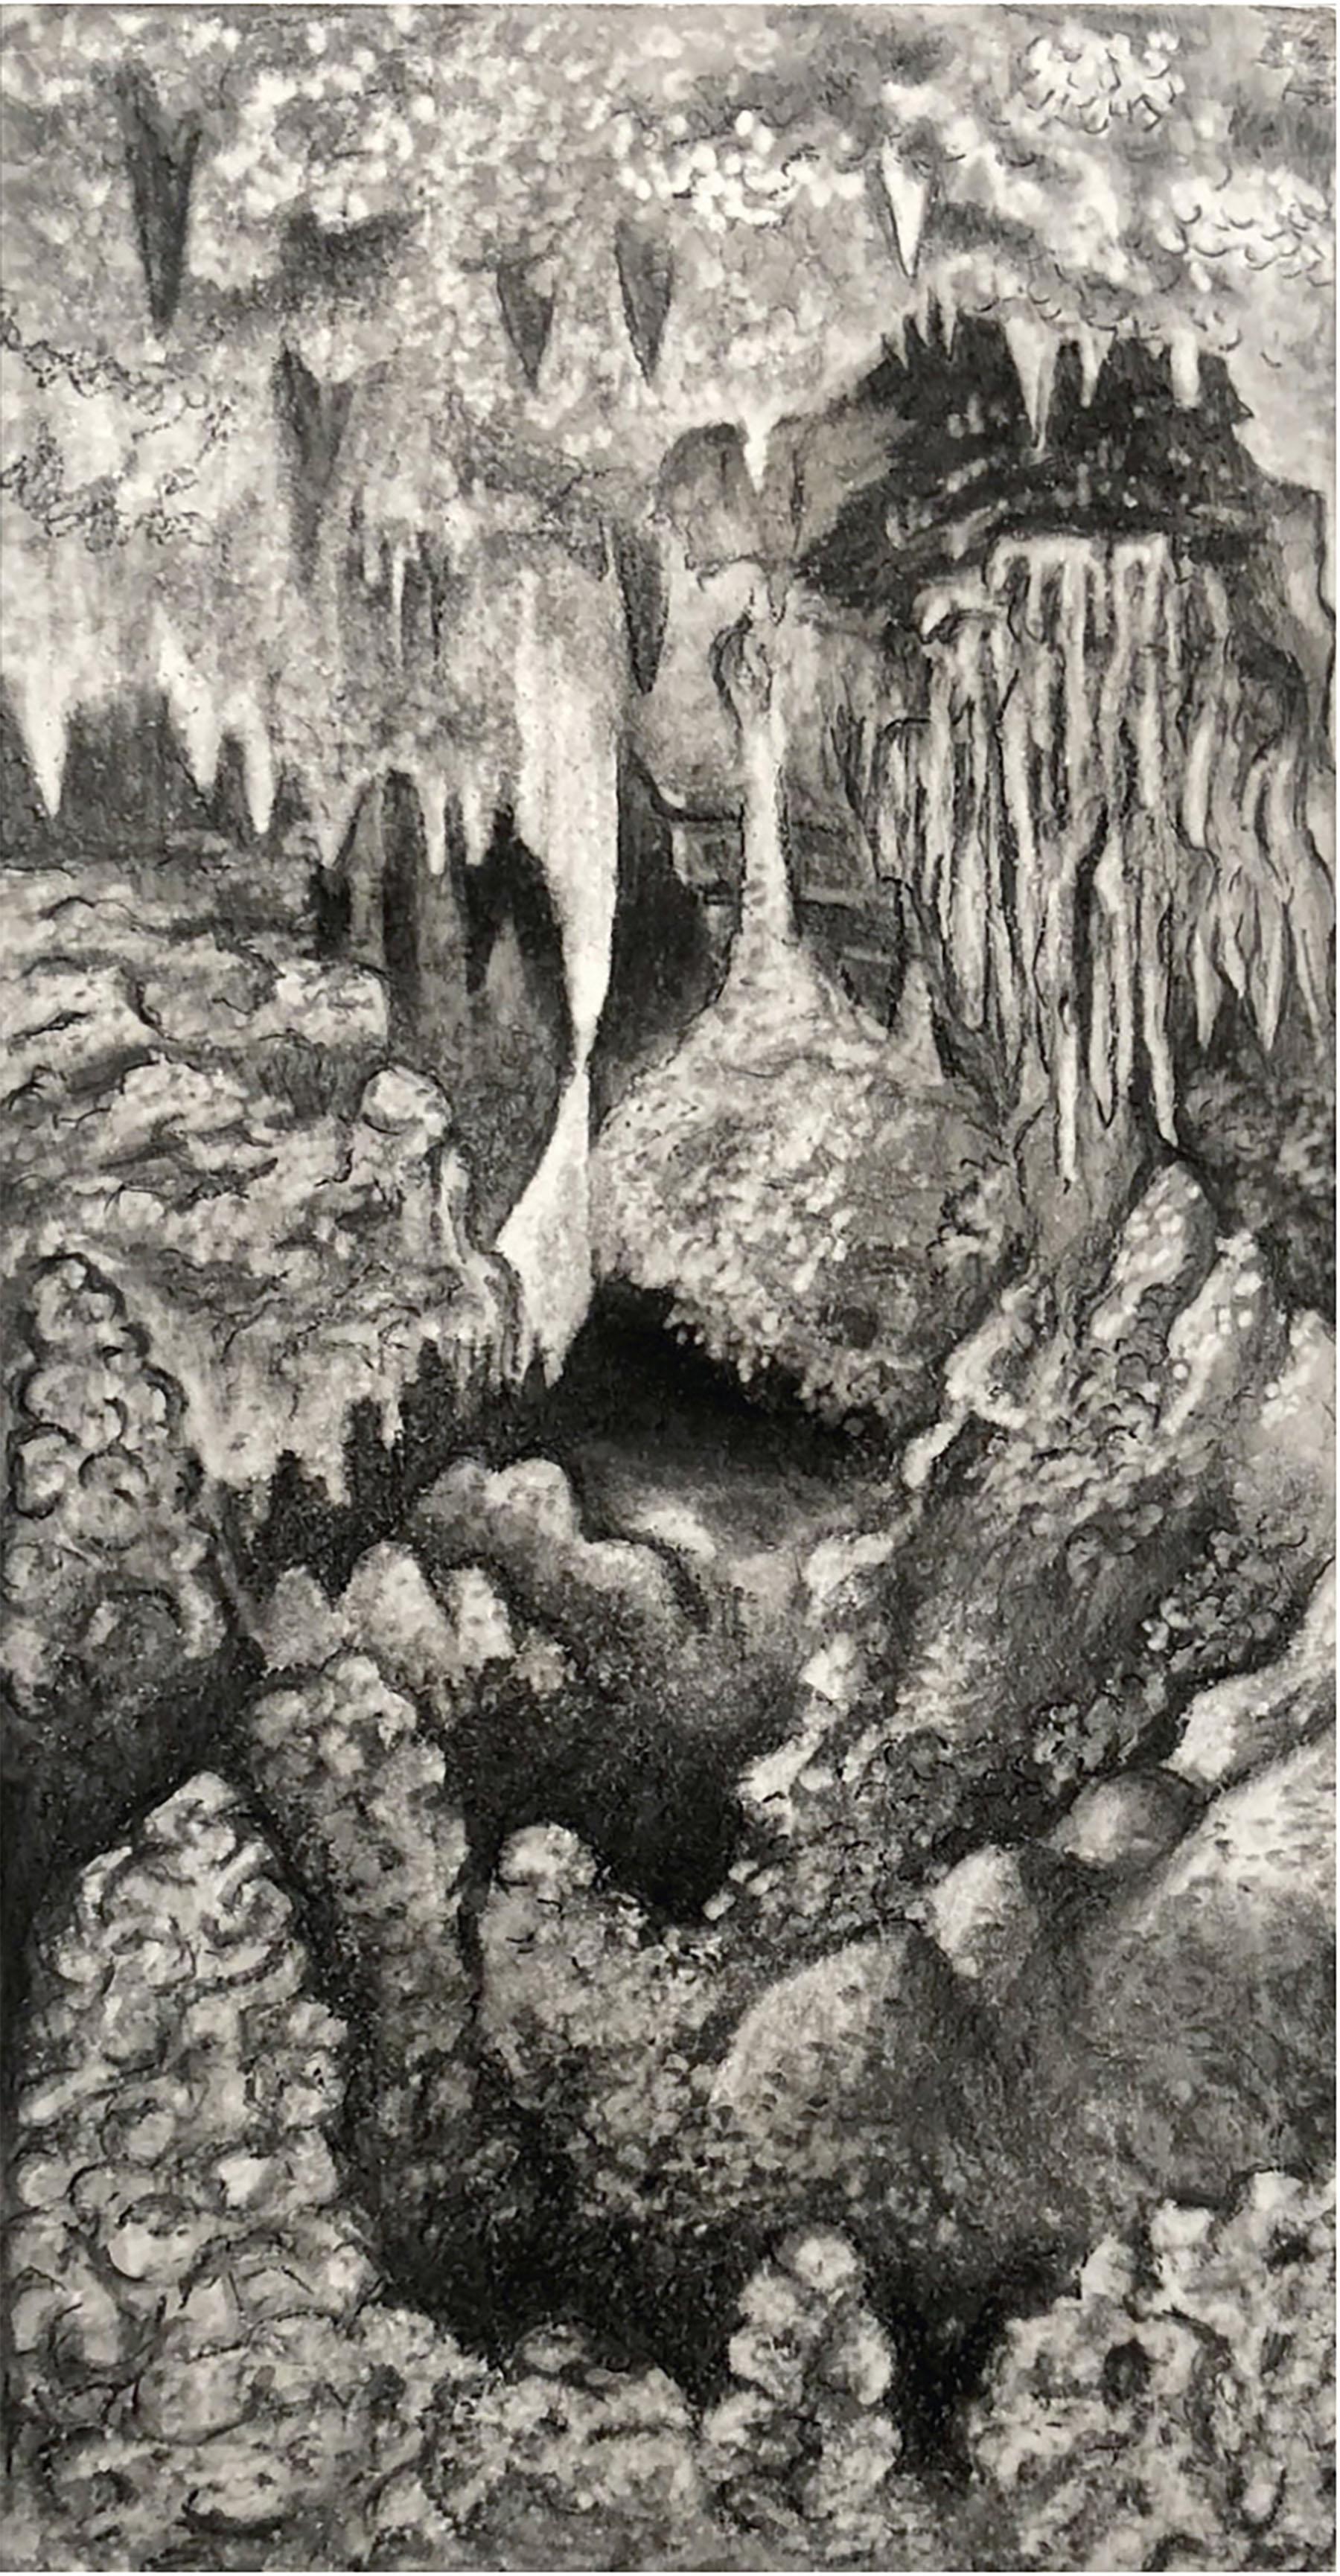 Caverns of Sonora, Wedding Room